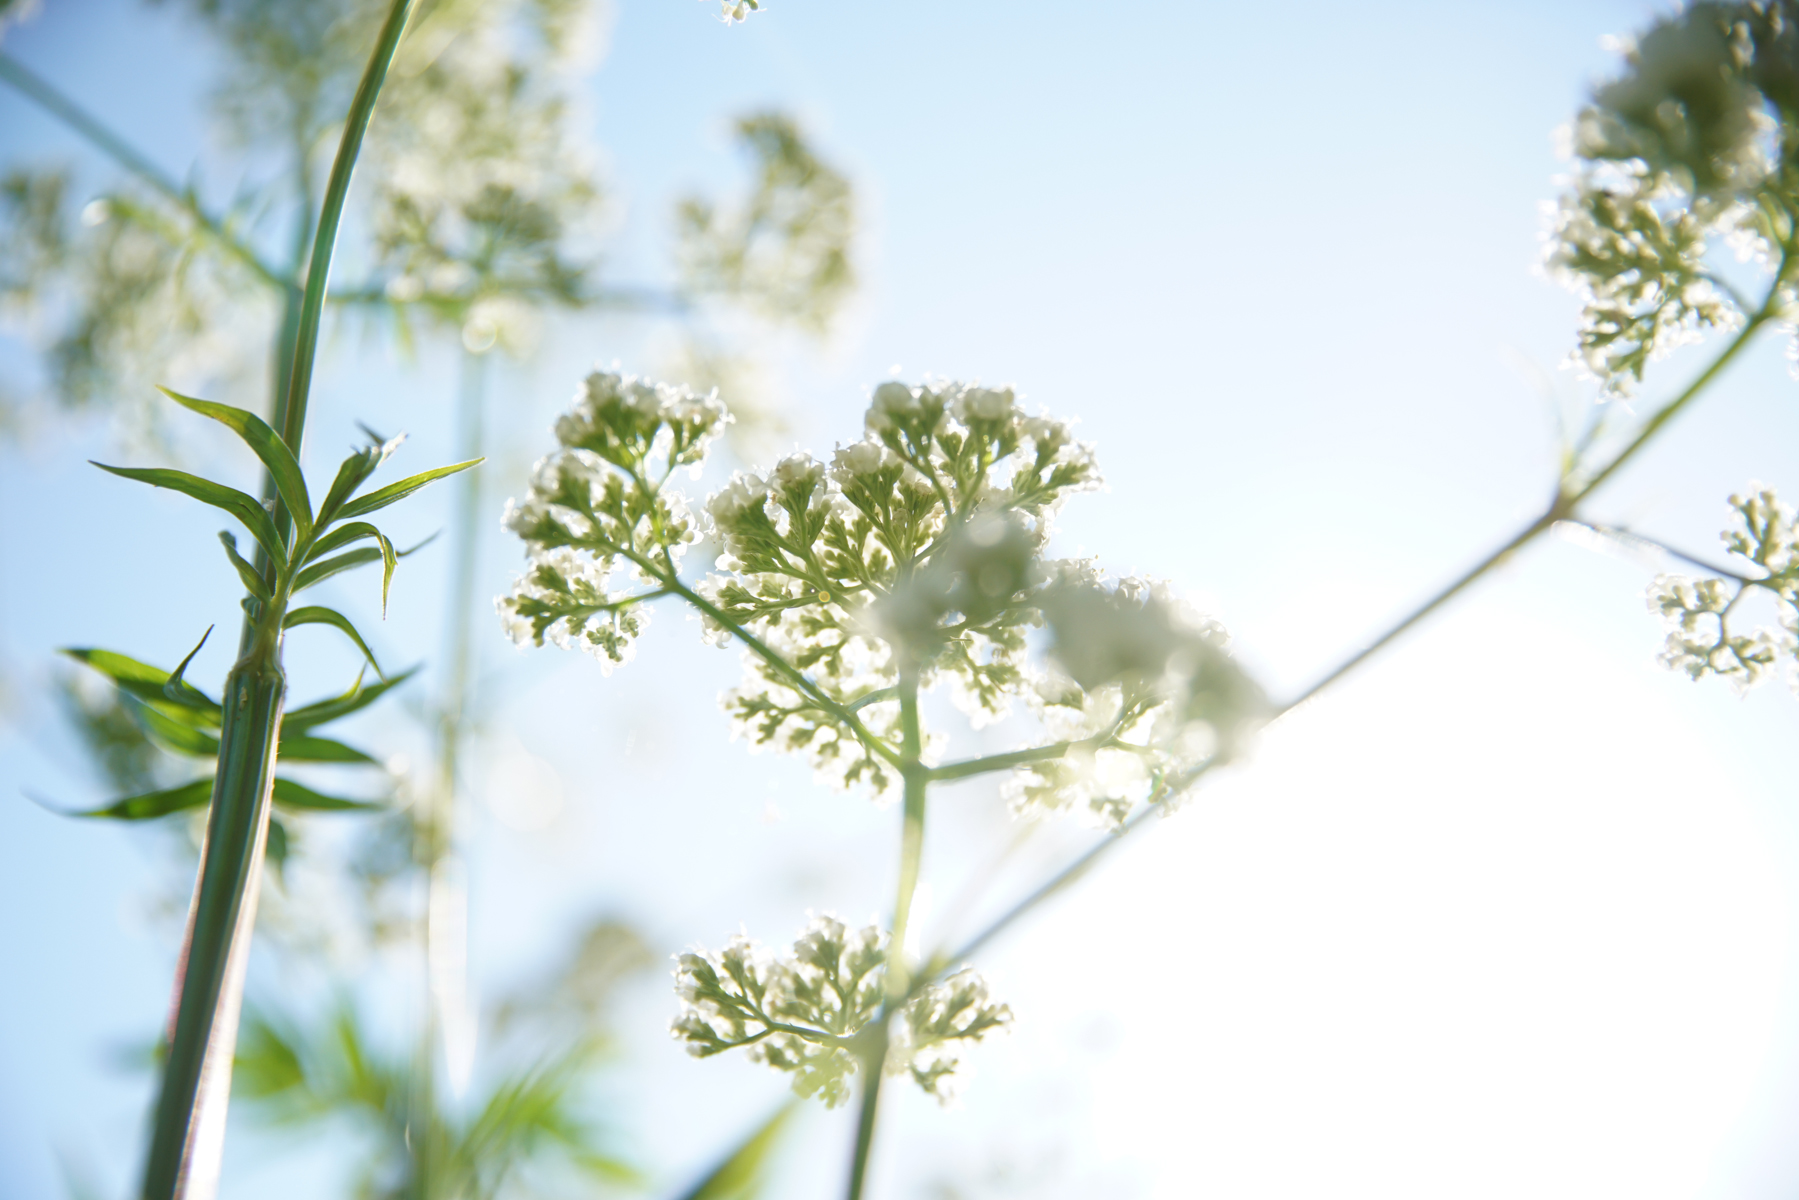 heartsong herbs_milky oats-2018051109977.jpg